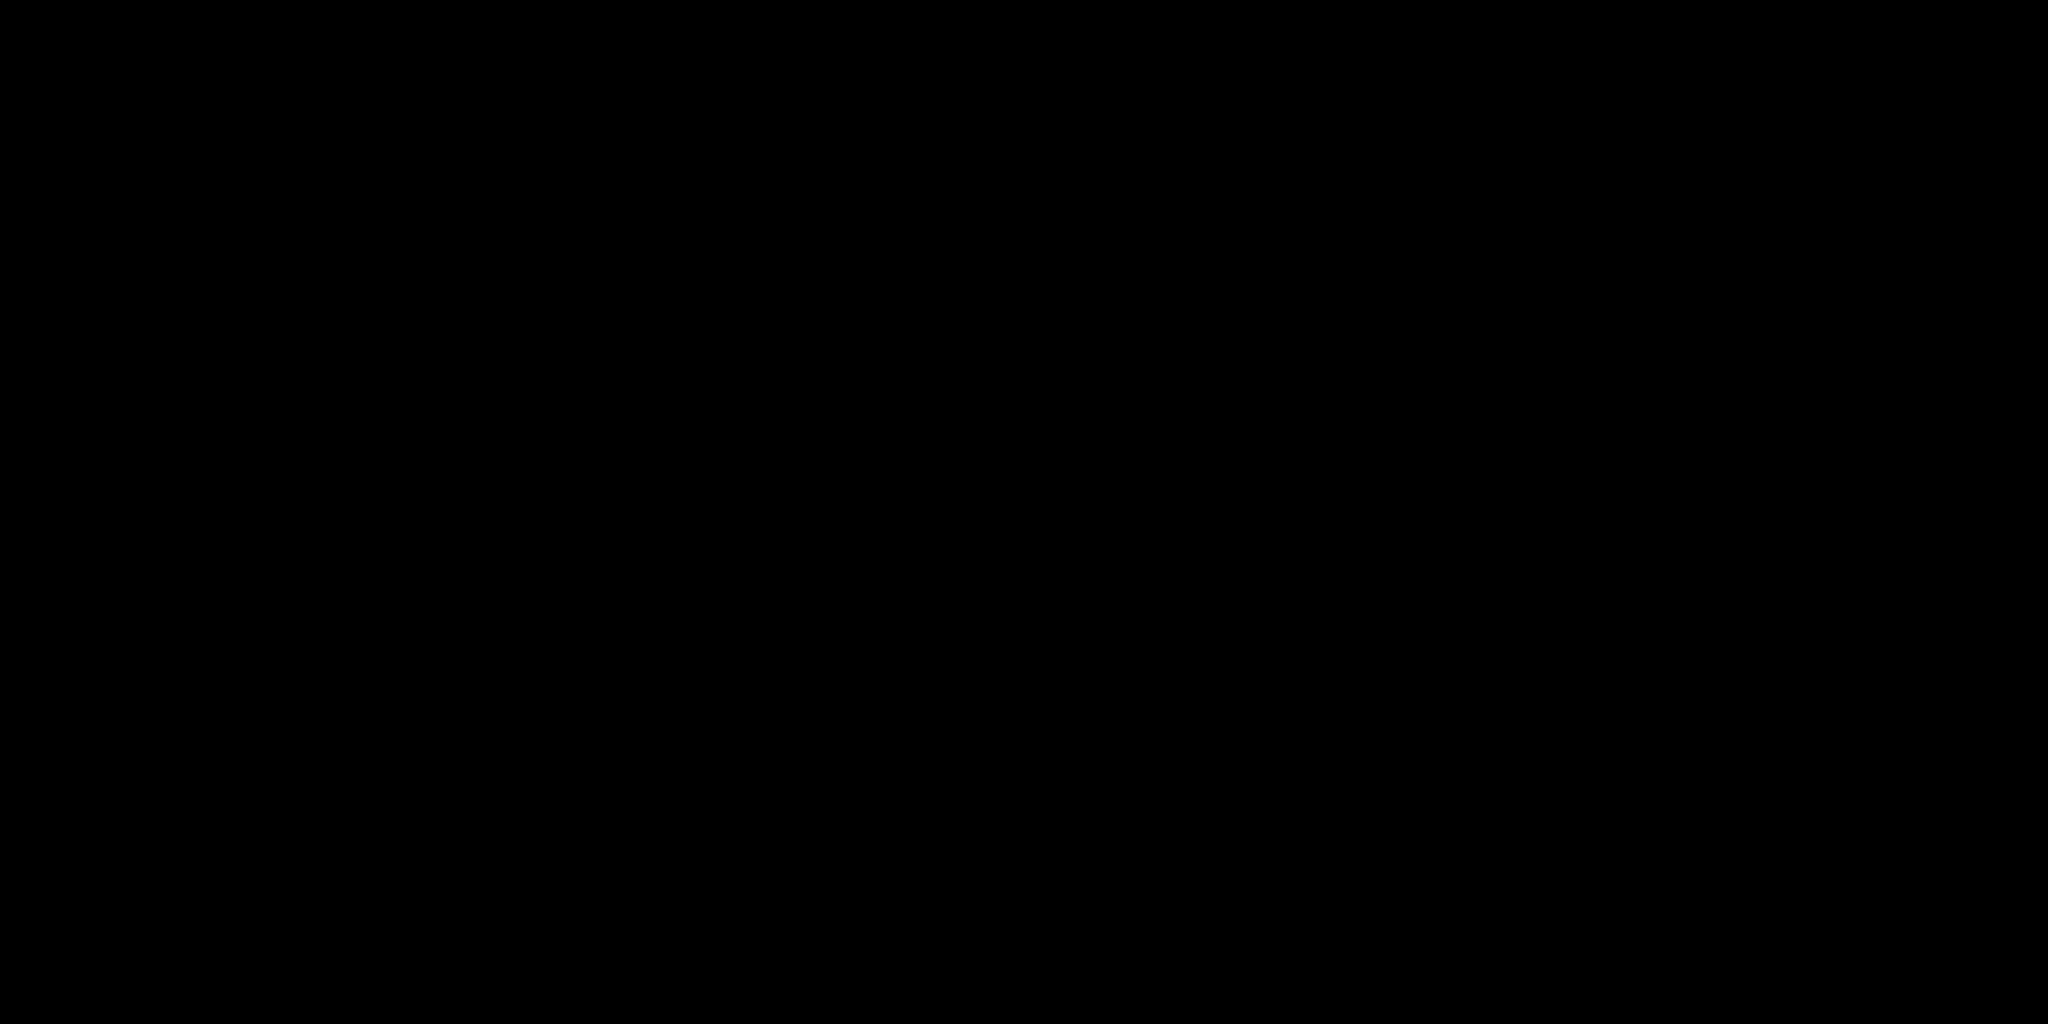 image1-1.png